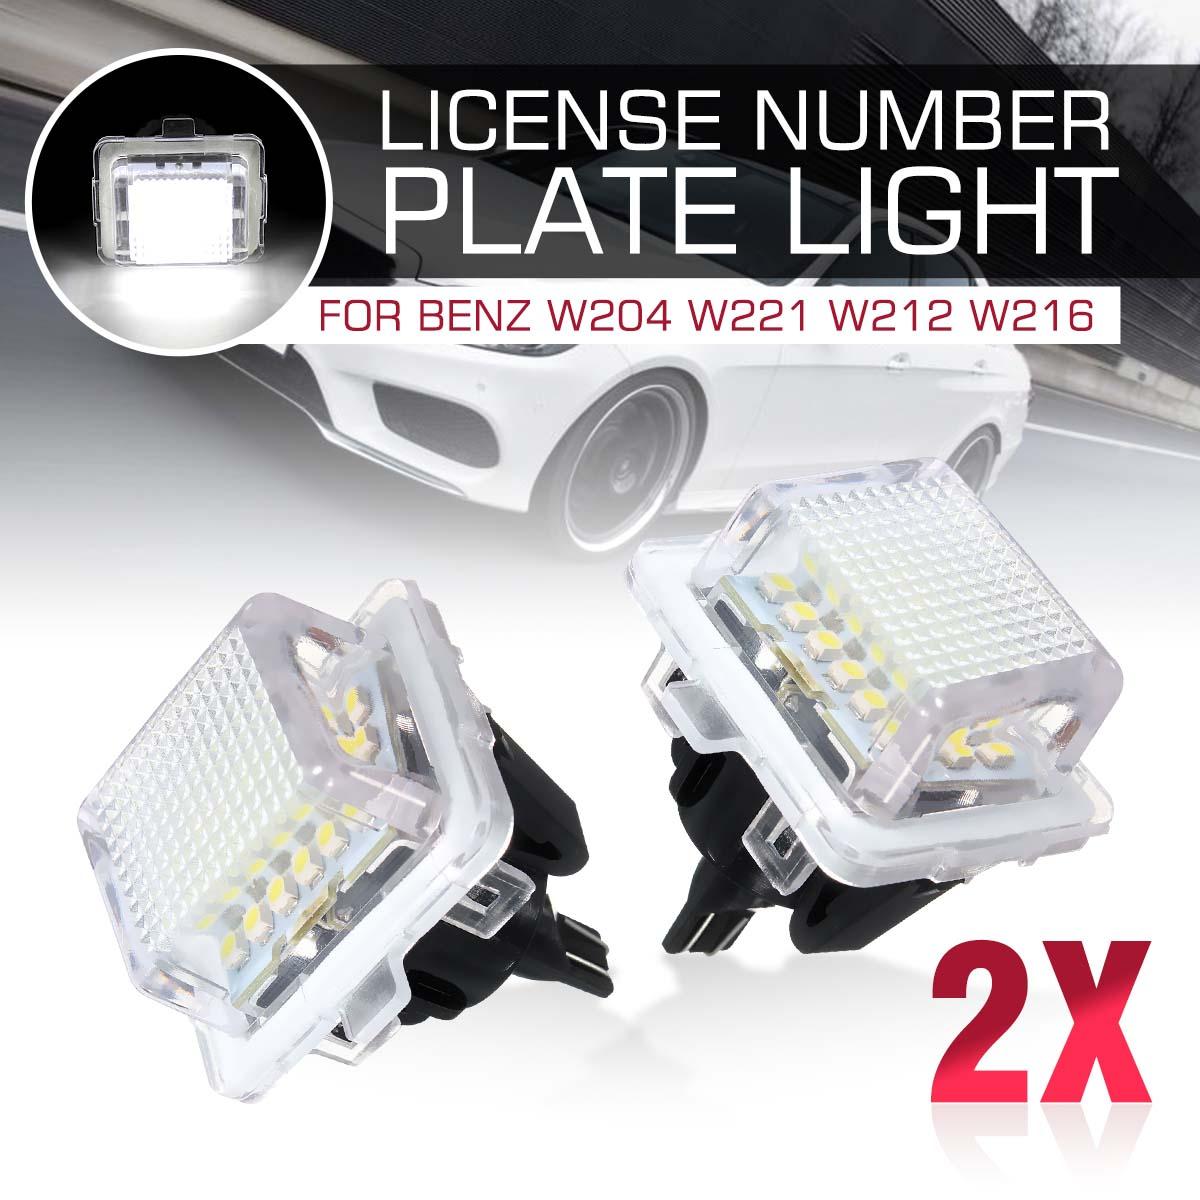 2pcs LED Car Number License Plate Light No Error For Mercedes-Benz W204 W204 5D W207 W212 W216 W221